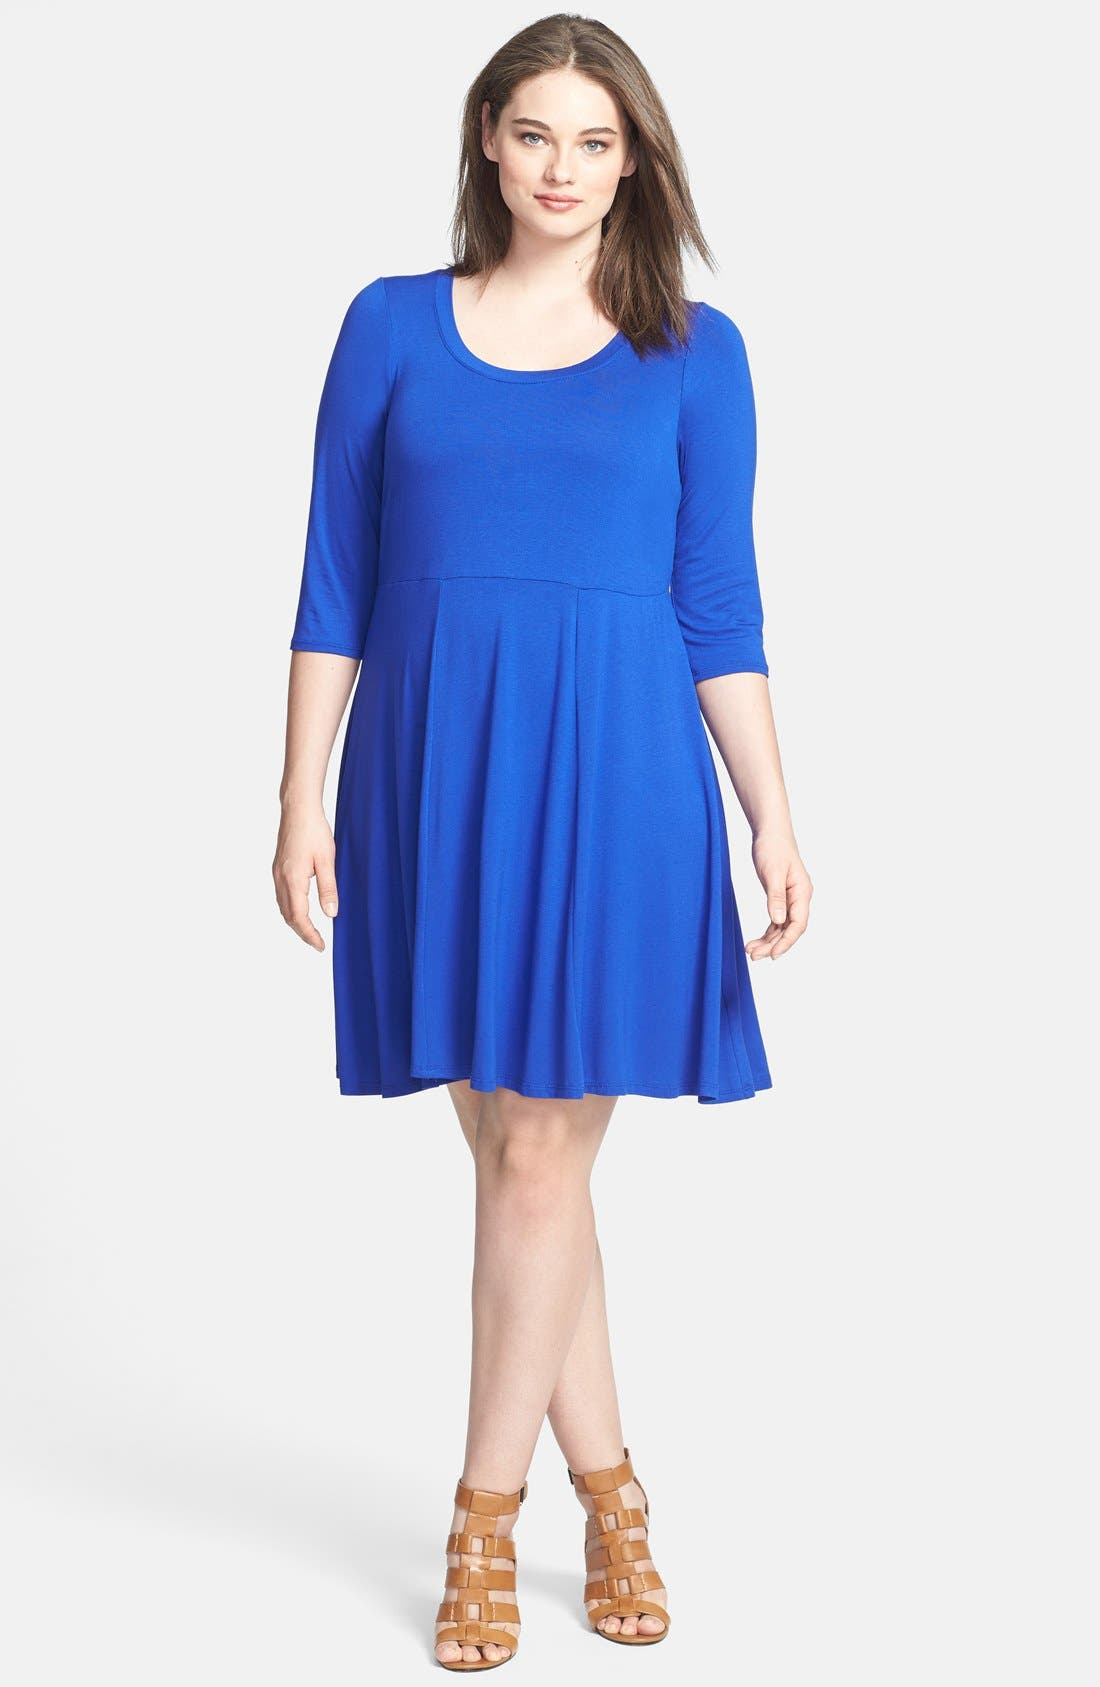 Alternate Image 1 Selected - Evans Fit & Flare Dress (Plus Size)